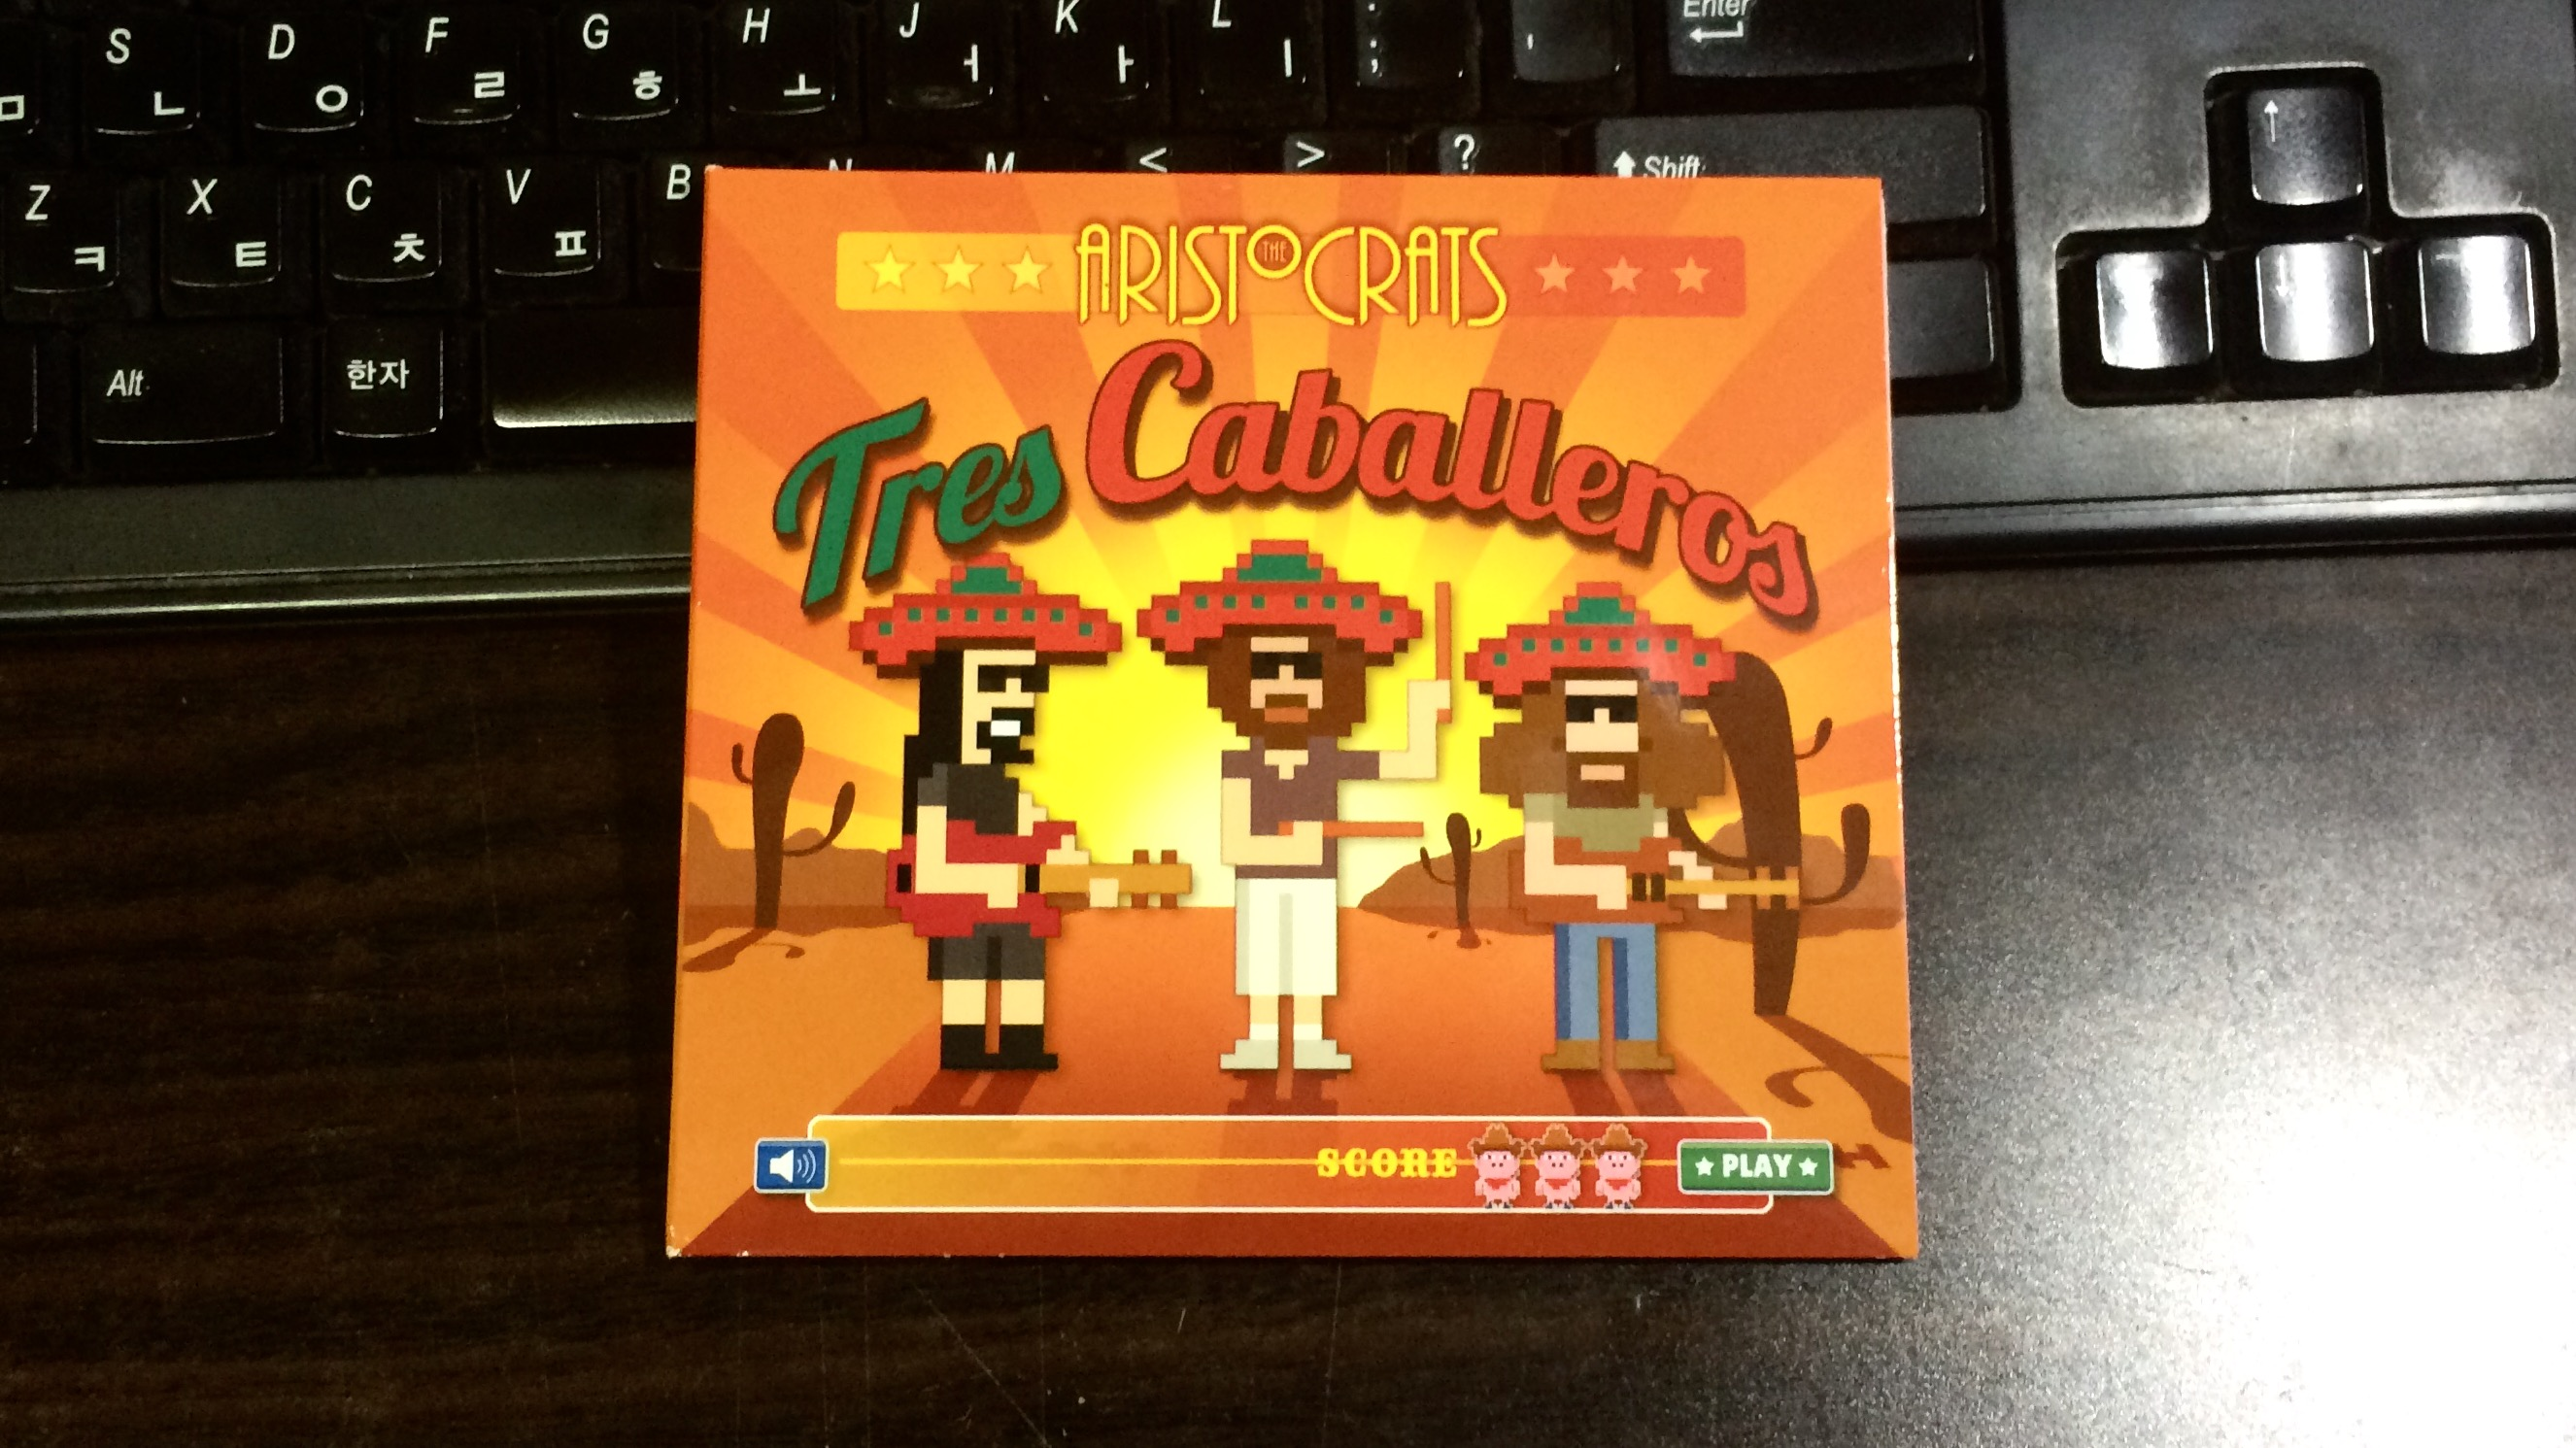 Tres Caballeros - The Aristocrats / 2015